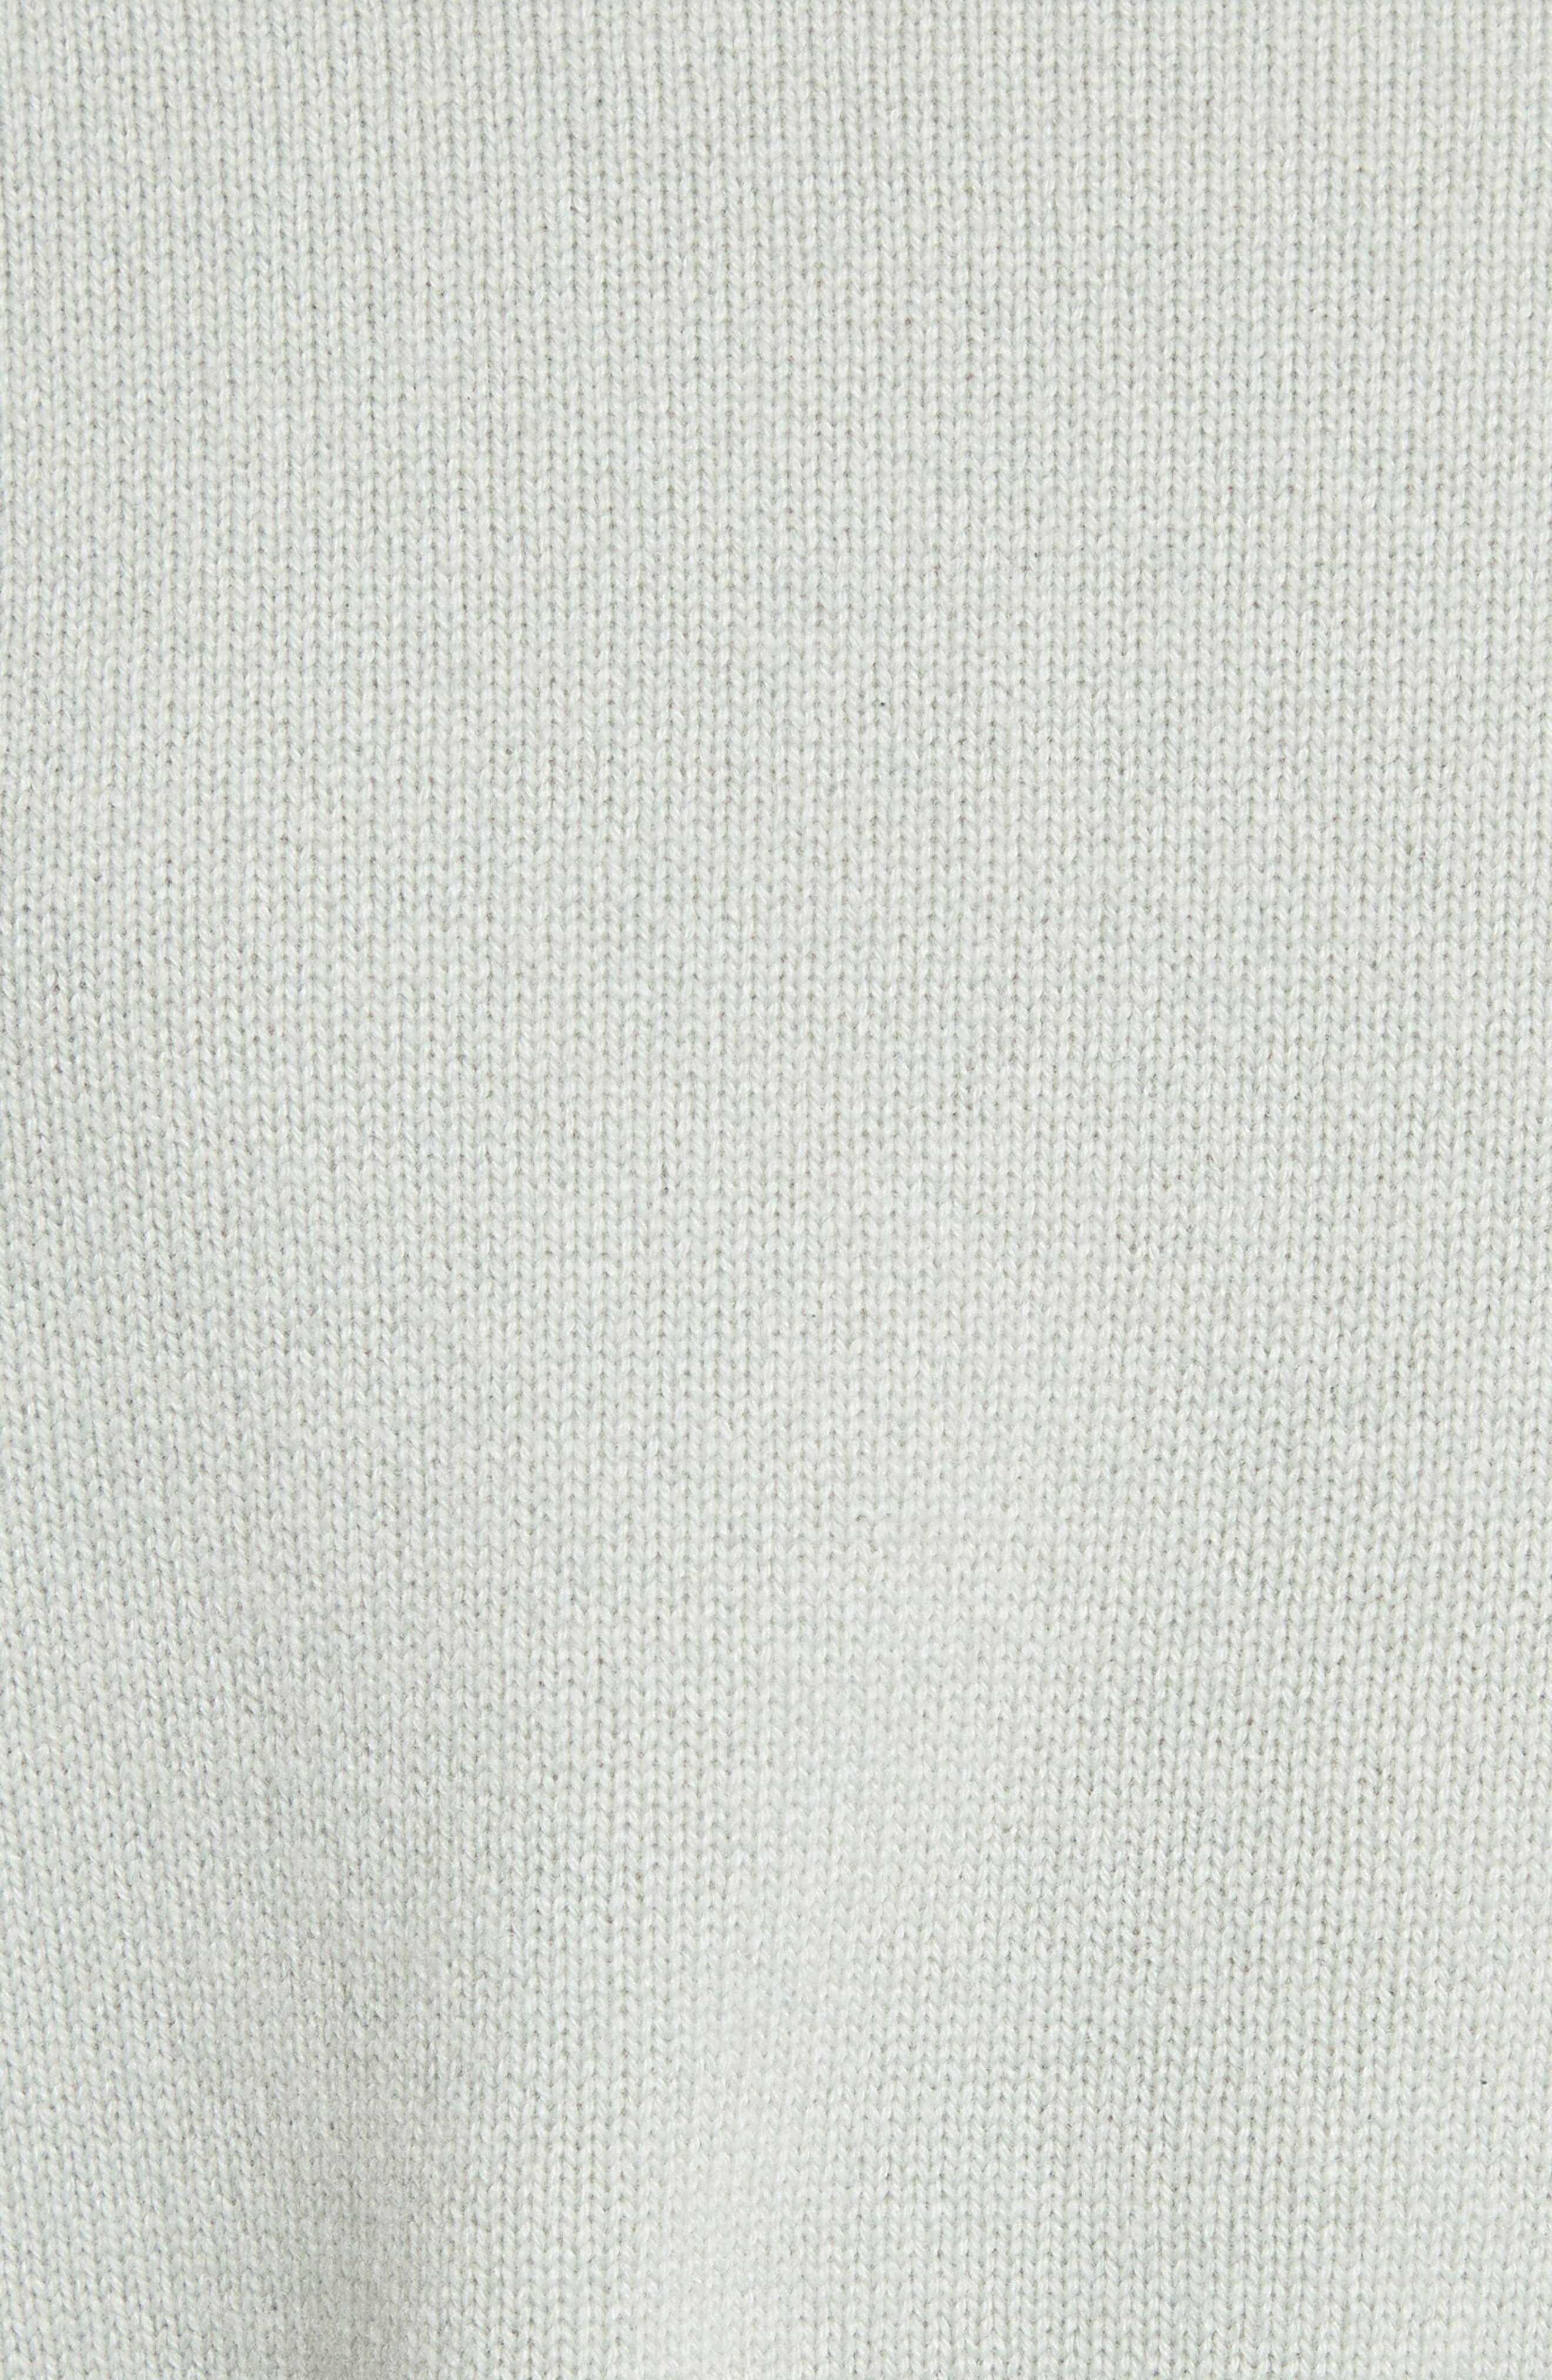 Boat Neck Cashmere Sweater,                             Alternate thumbnail 5, color,                             374